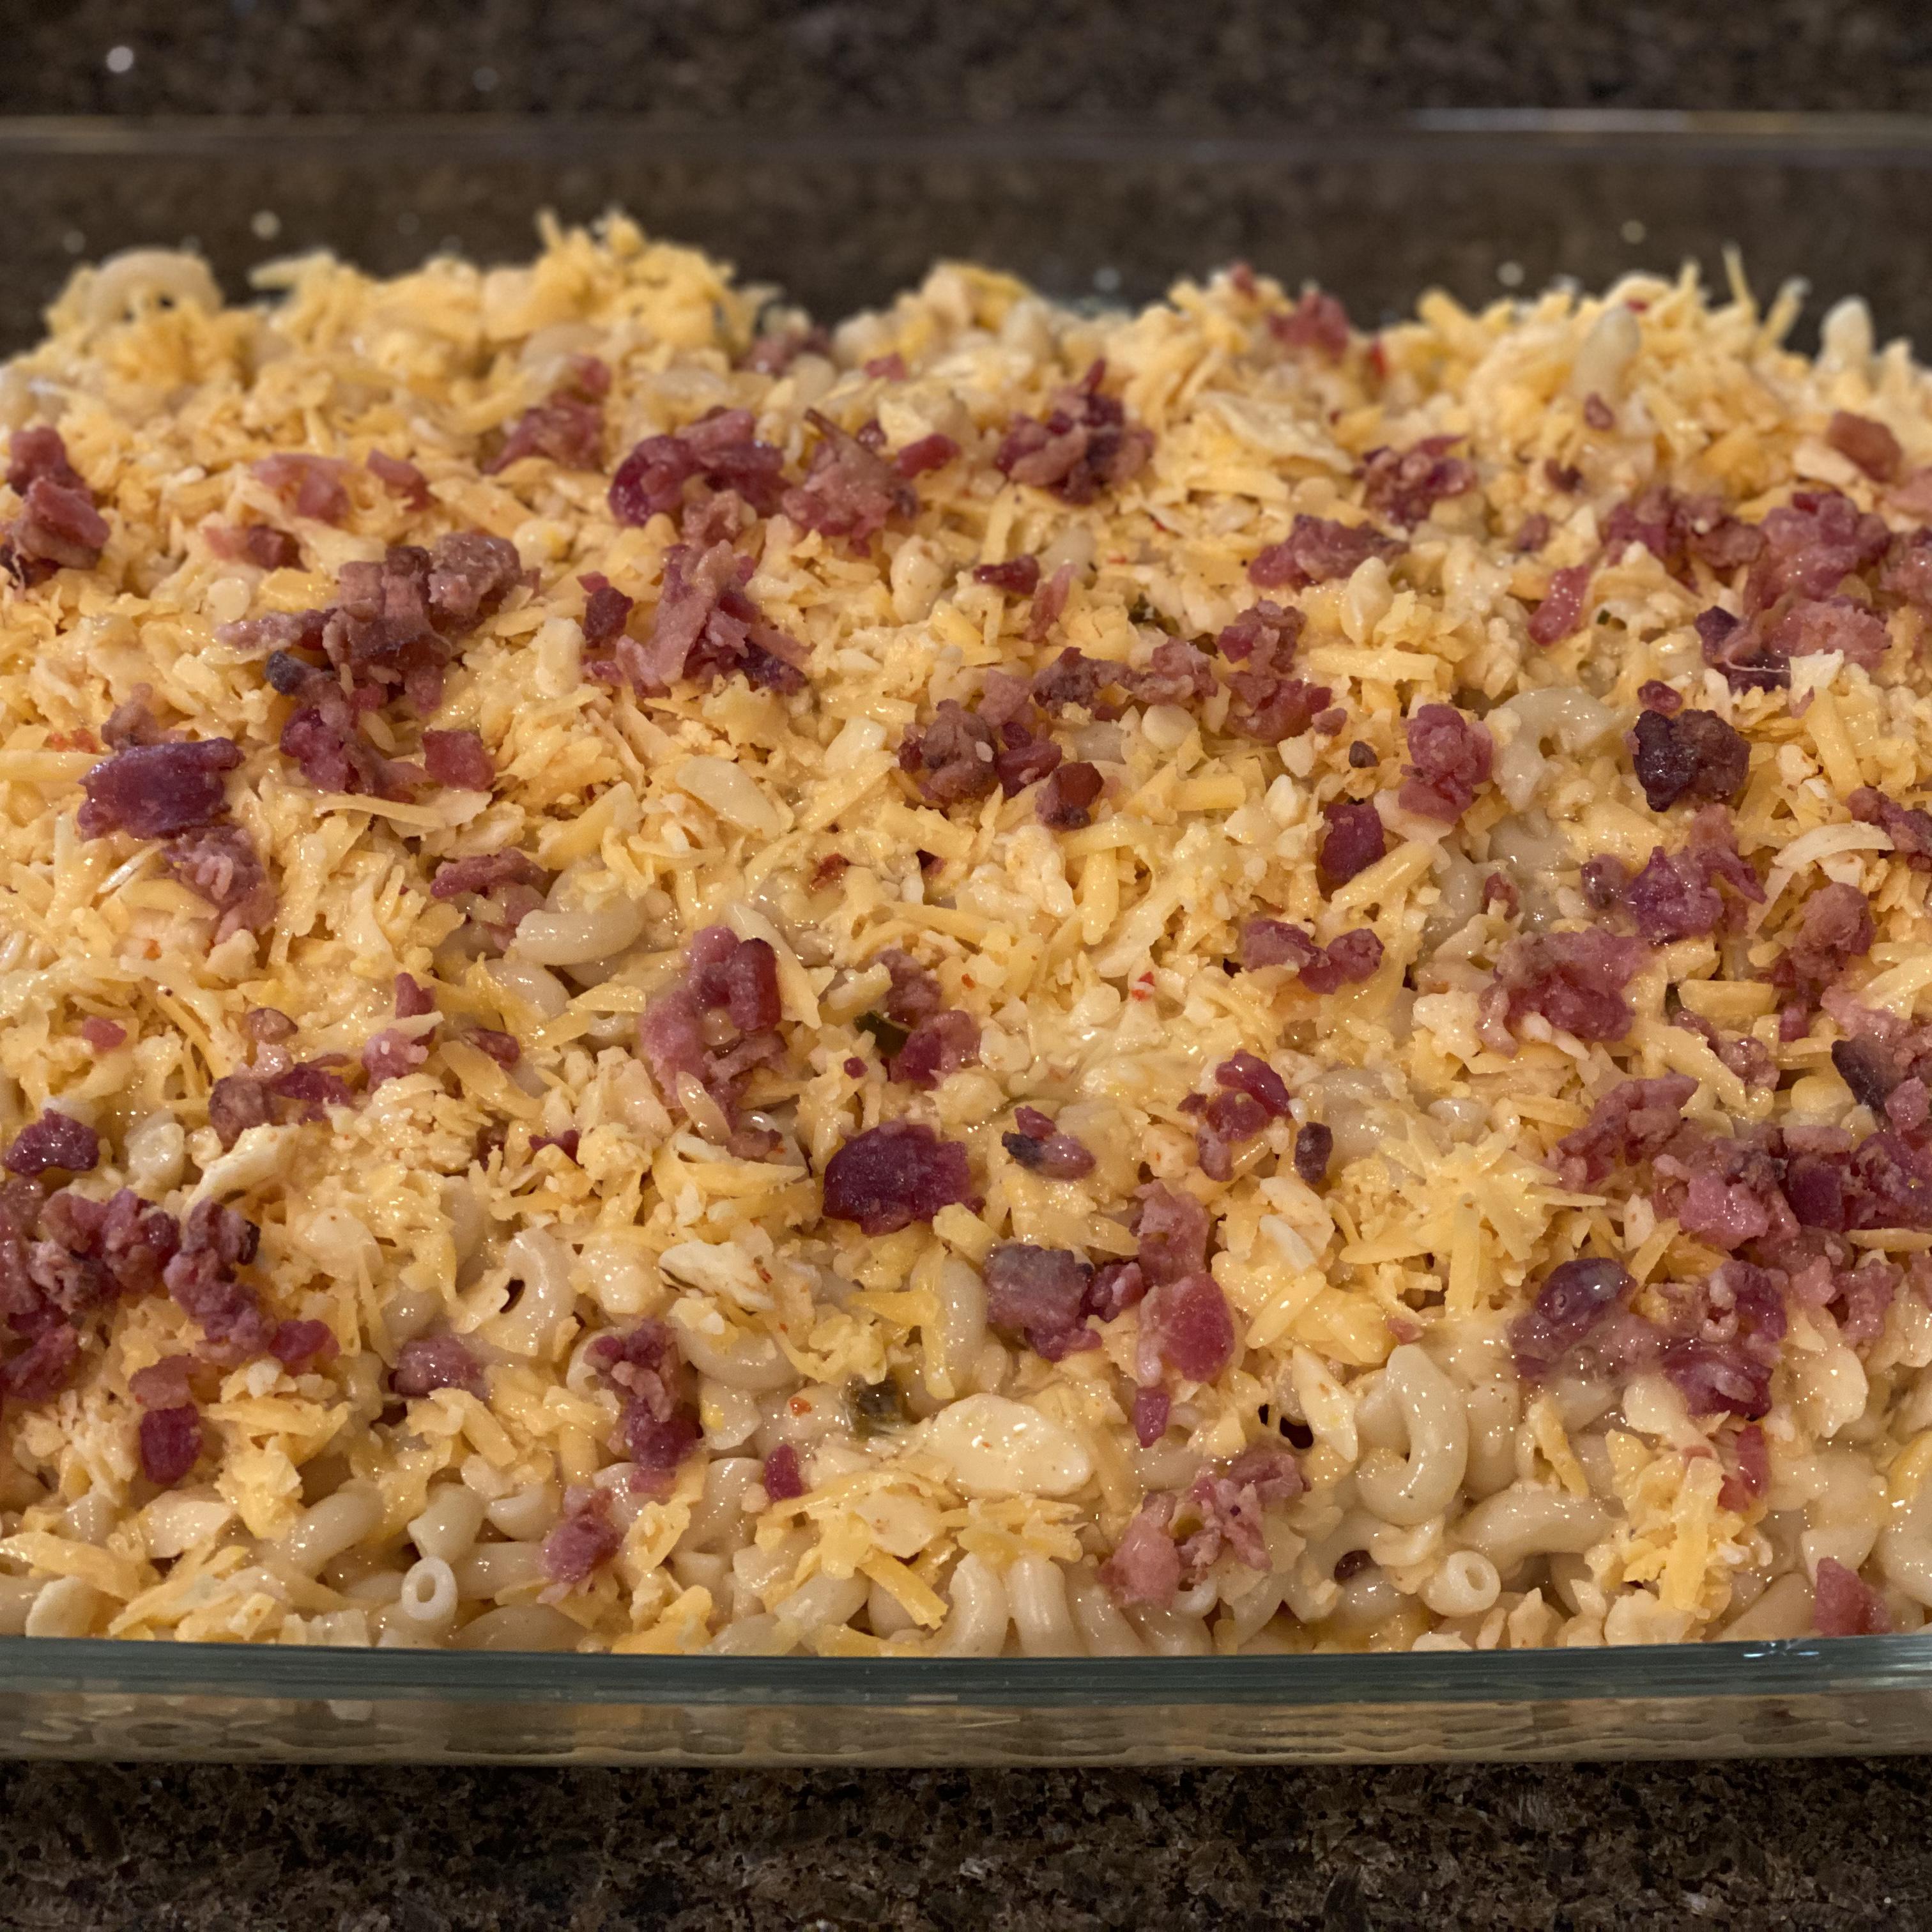 Grandma's Southern Mac and Cheese